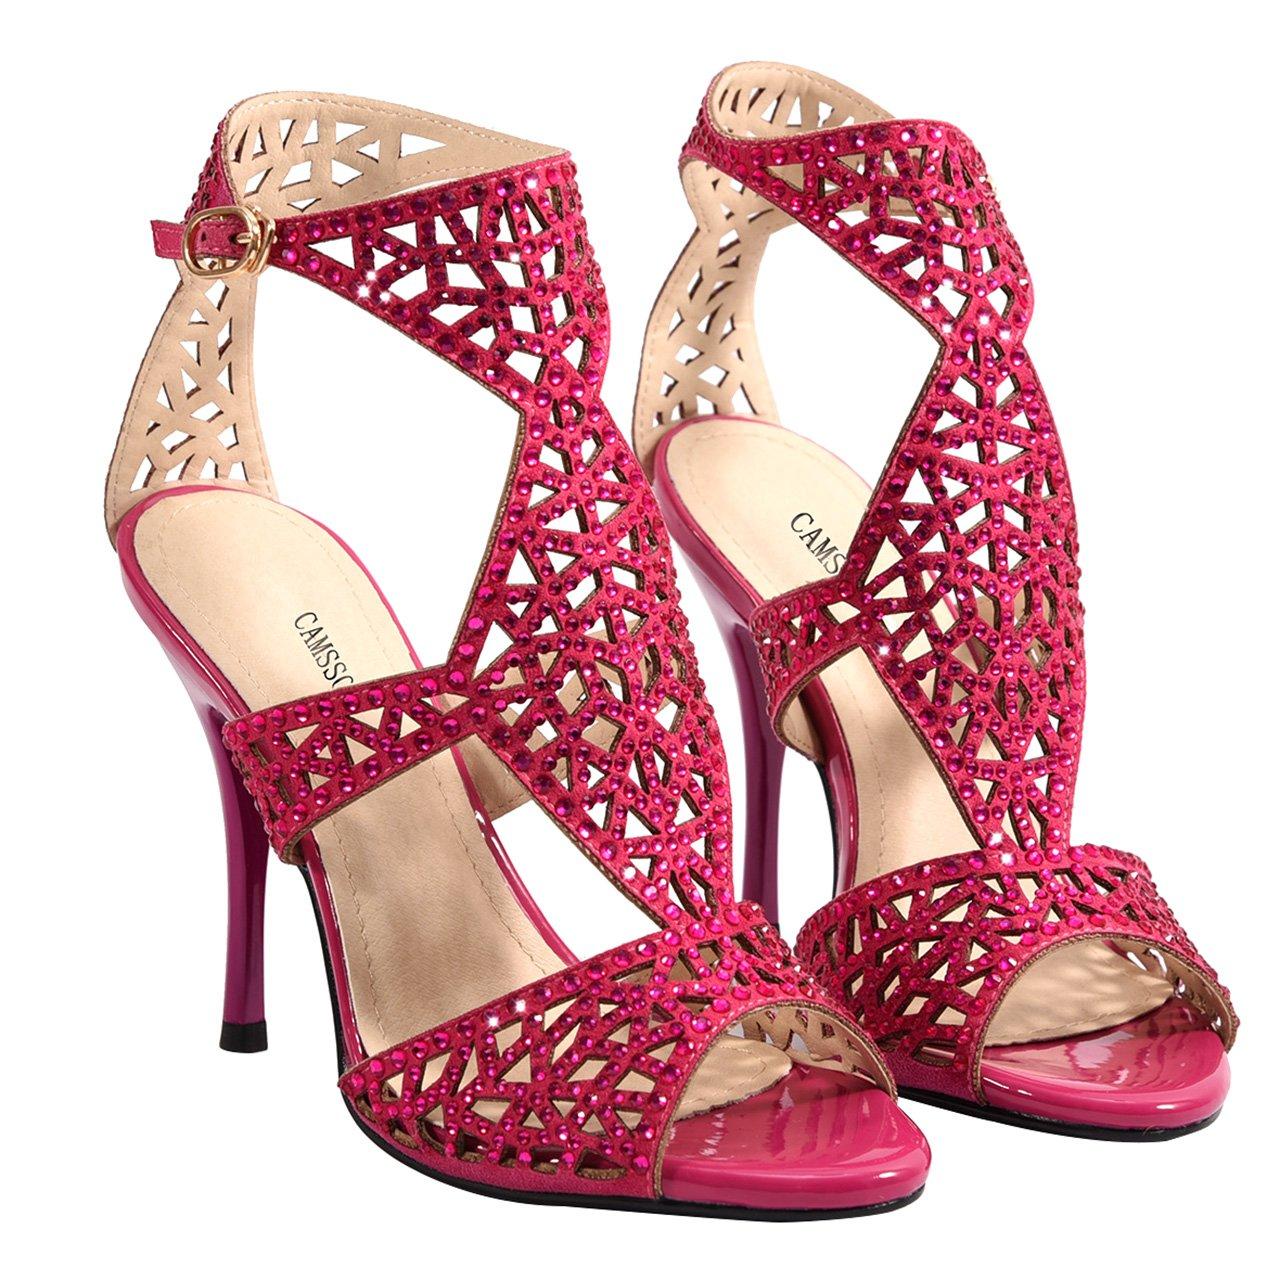 CAMSSOO de Sandalias de tacón Toe de mujer con tacón de Rosa aguja ...